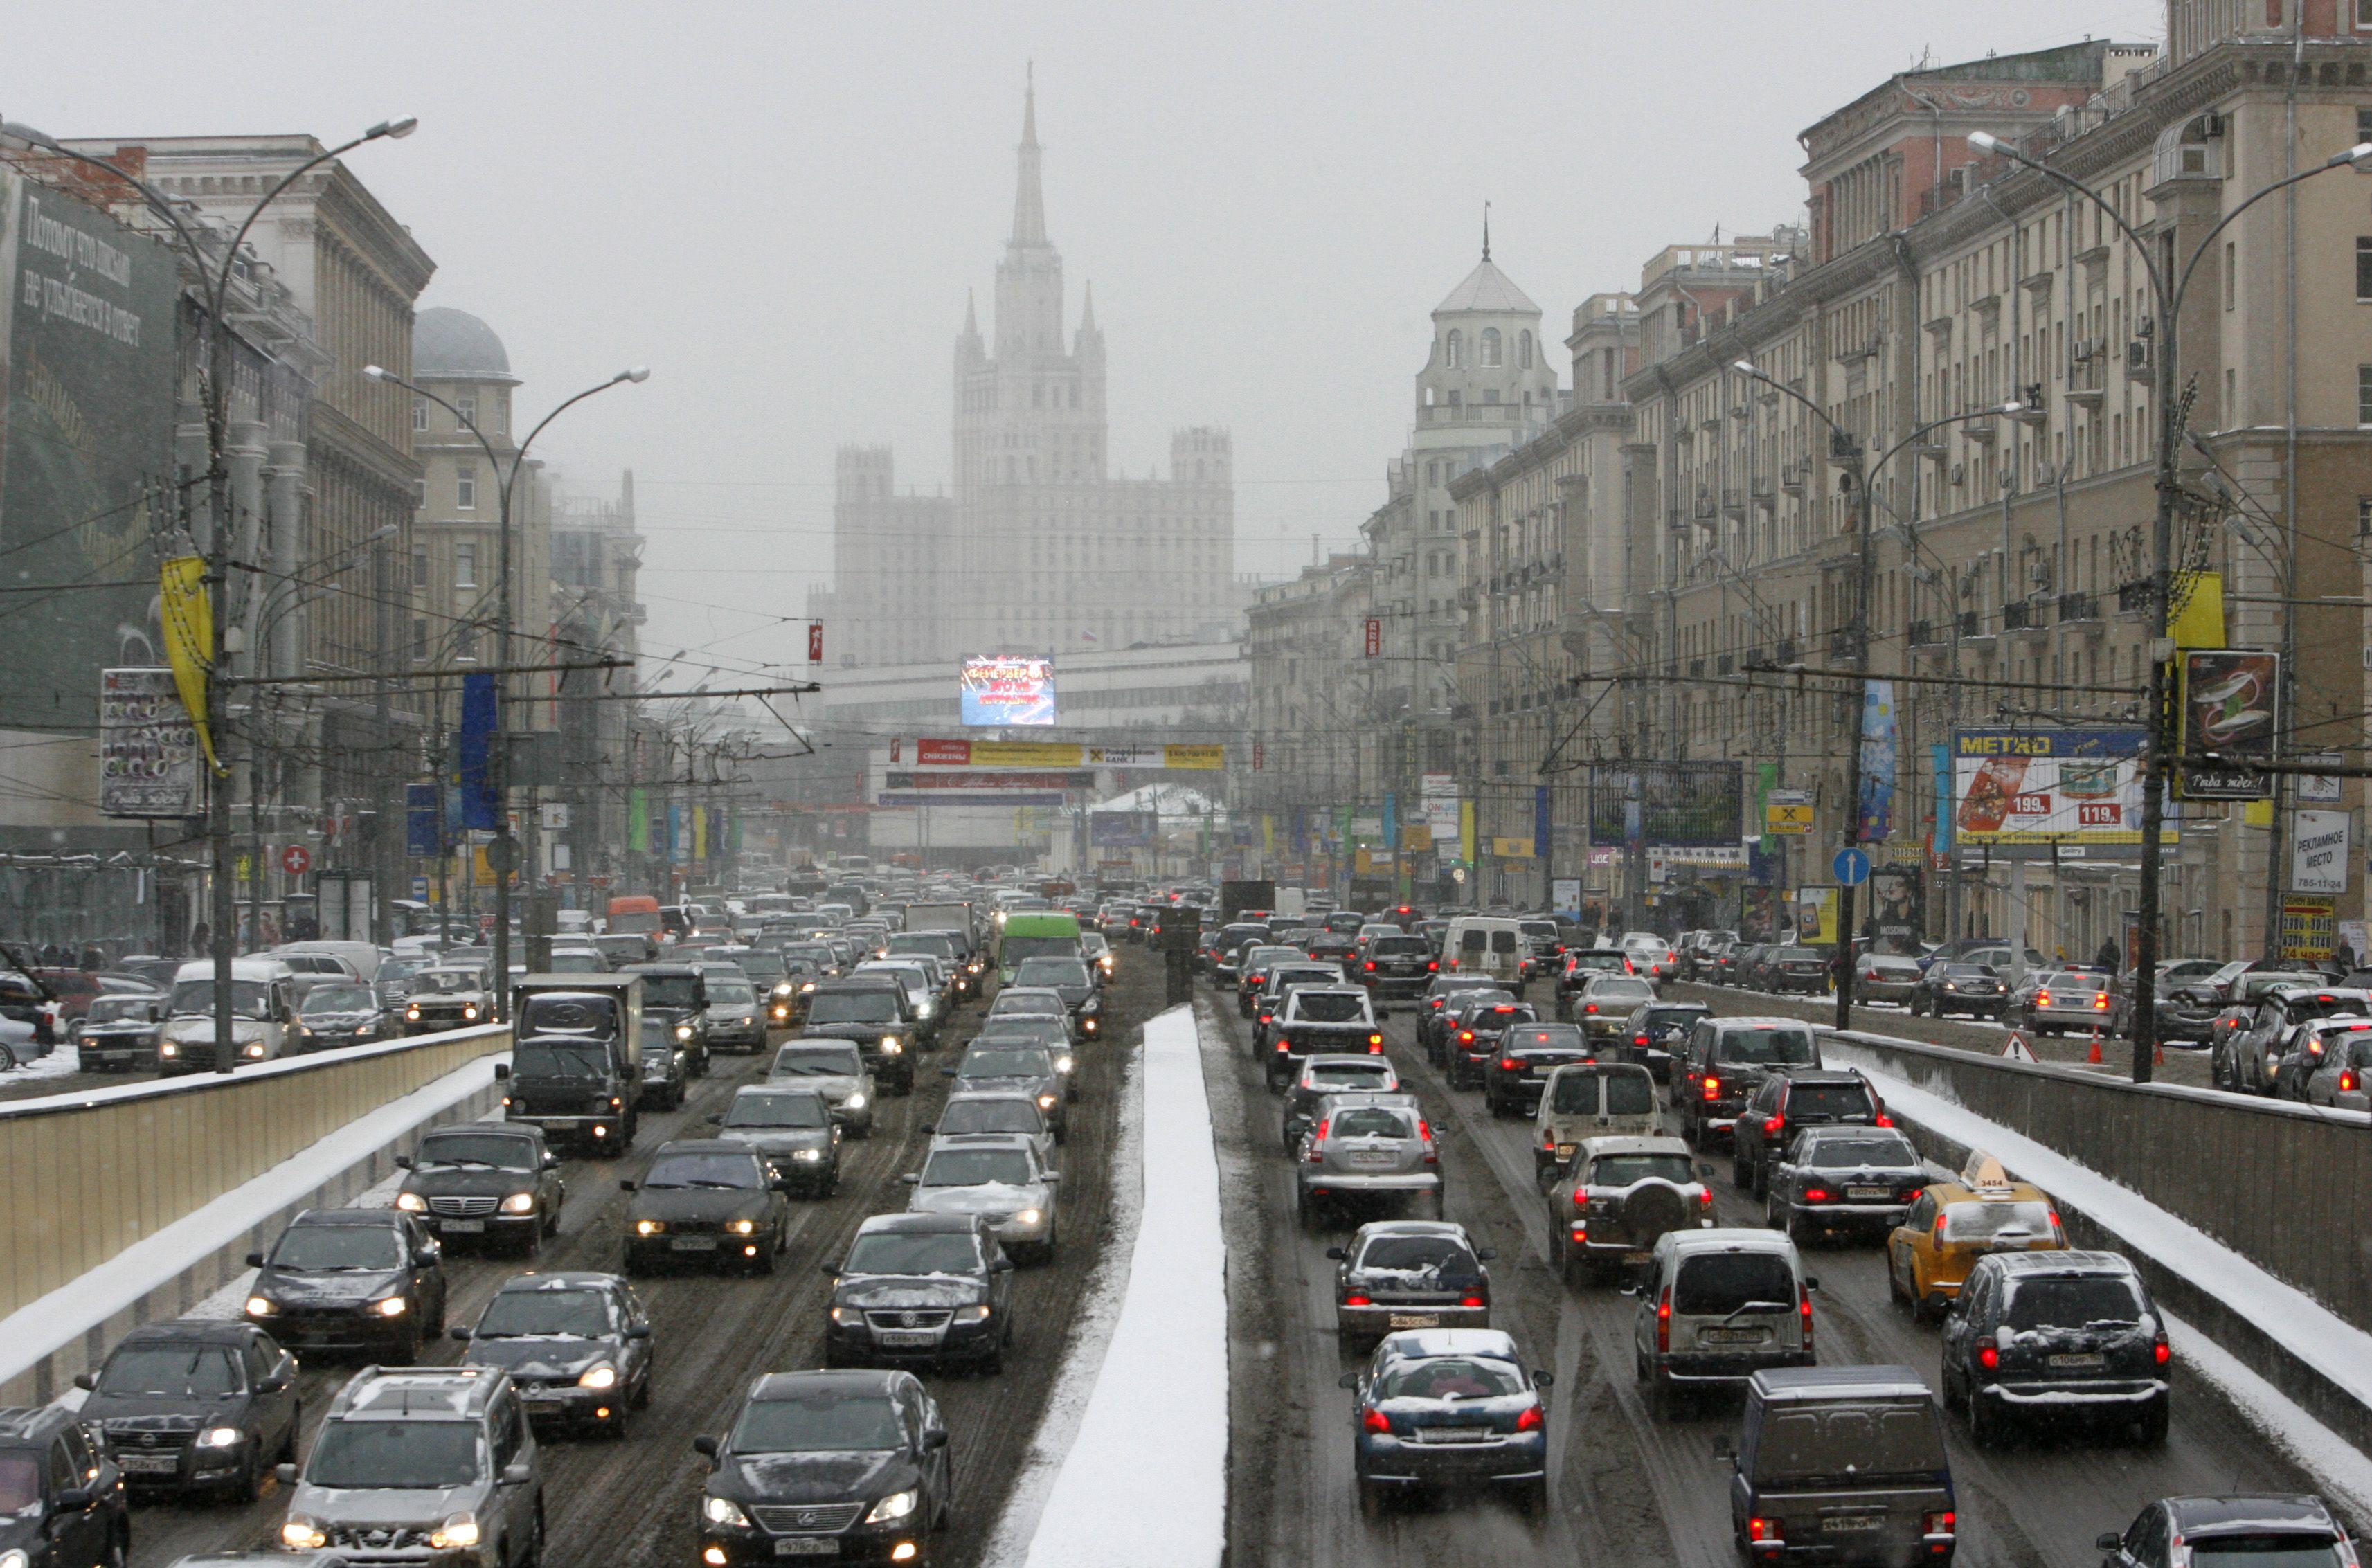 Tráfico en Moscú. Foto de Reuters/Sergei Karpukhin